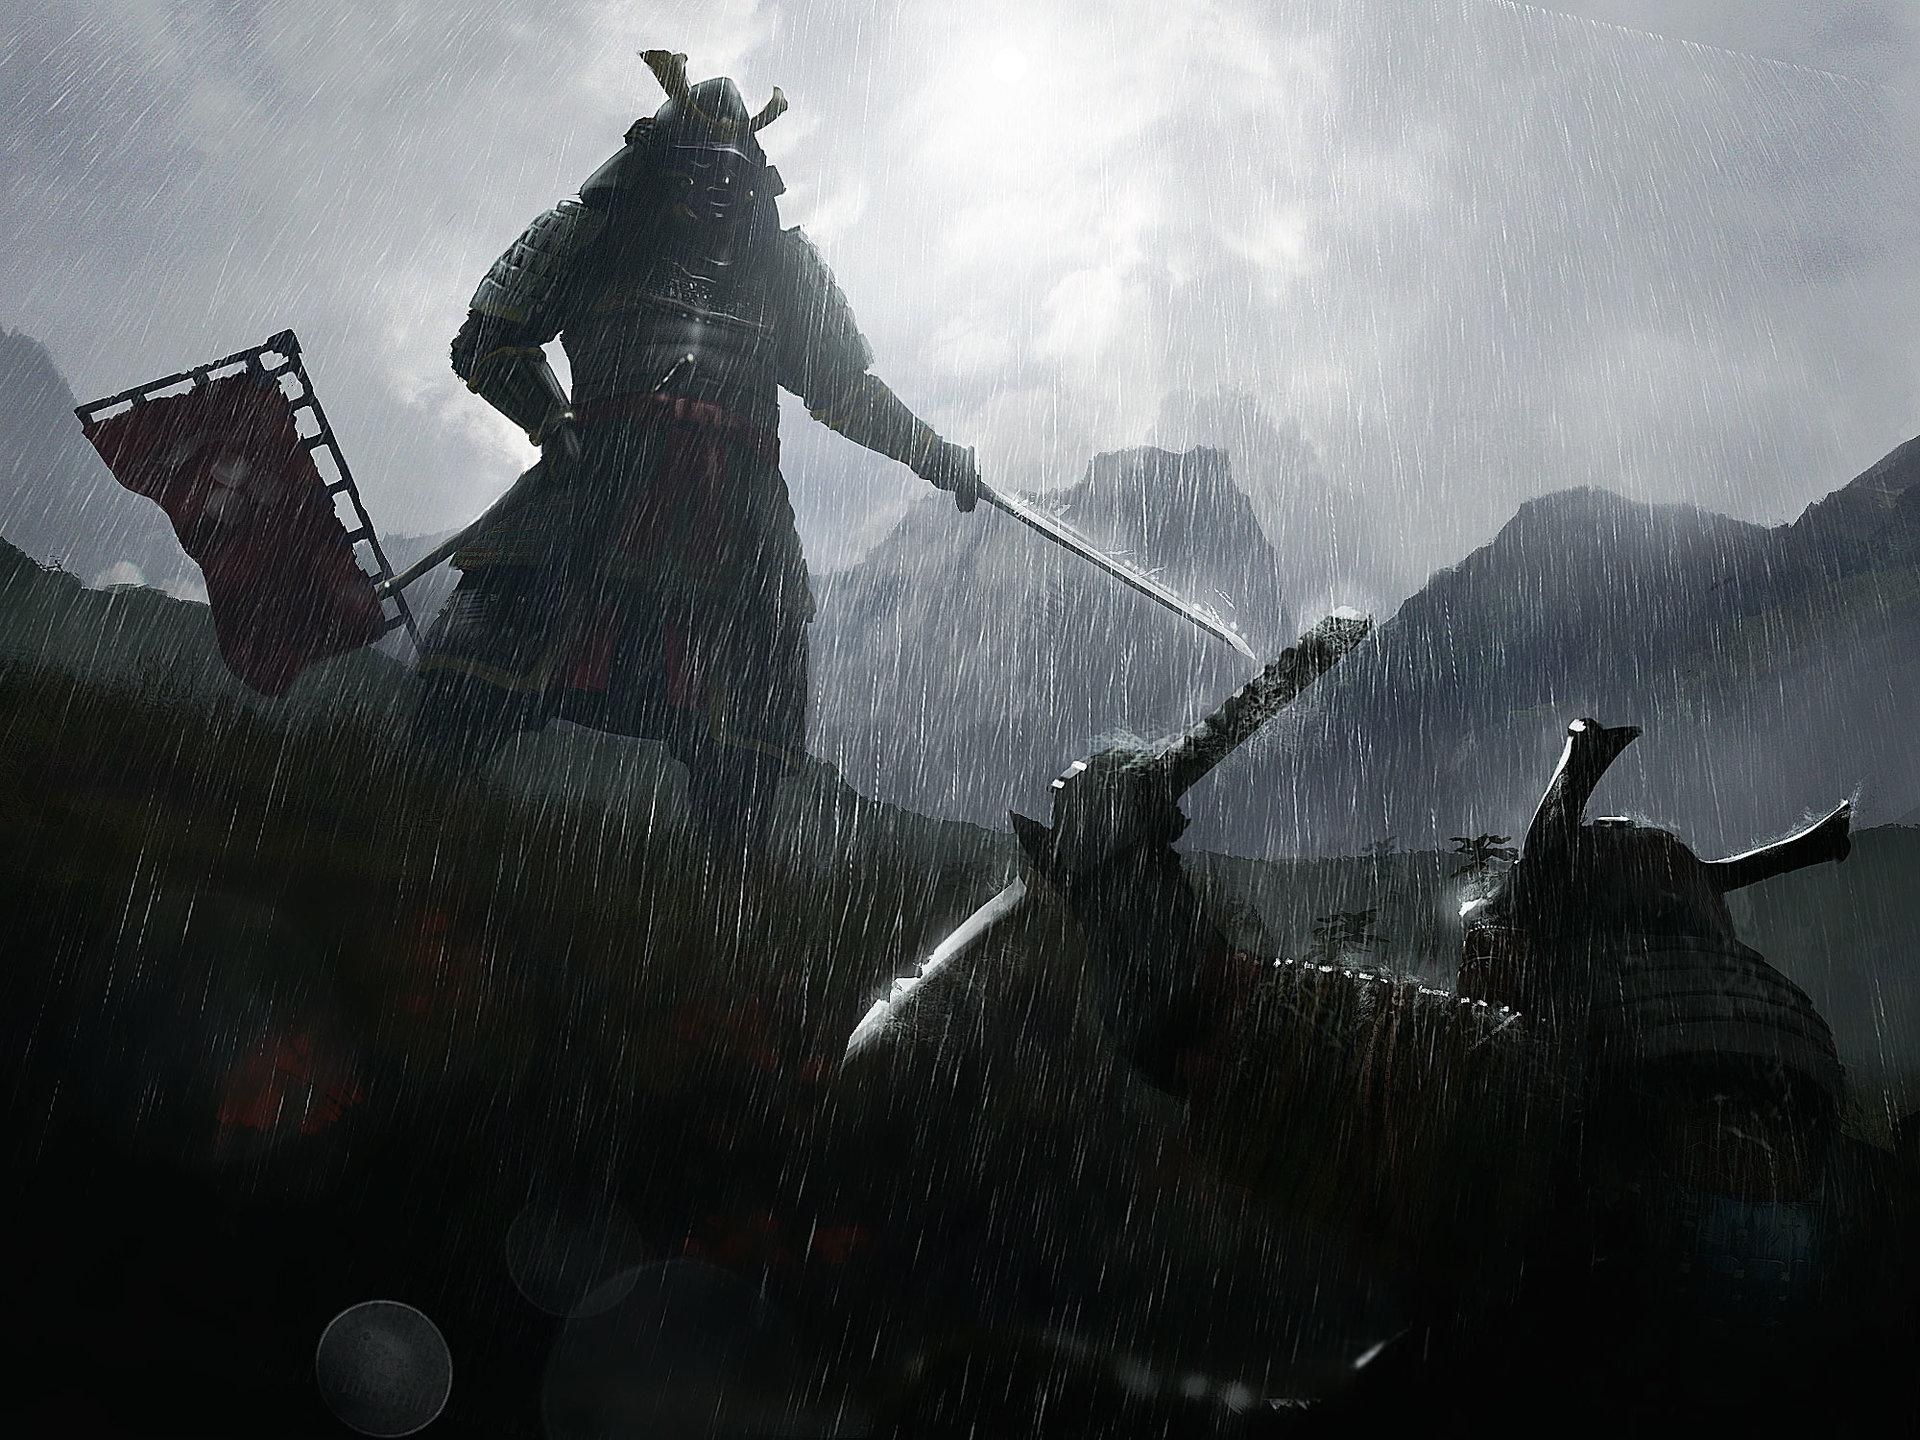 Nicolas chacin samurai3